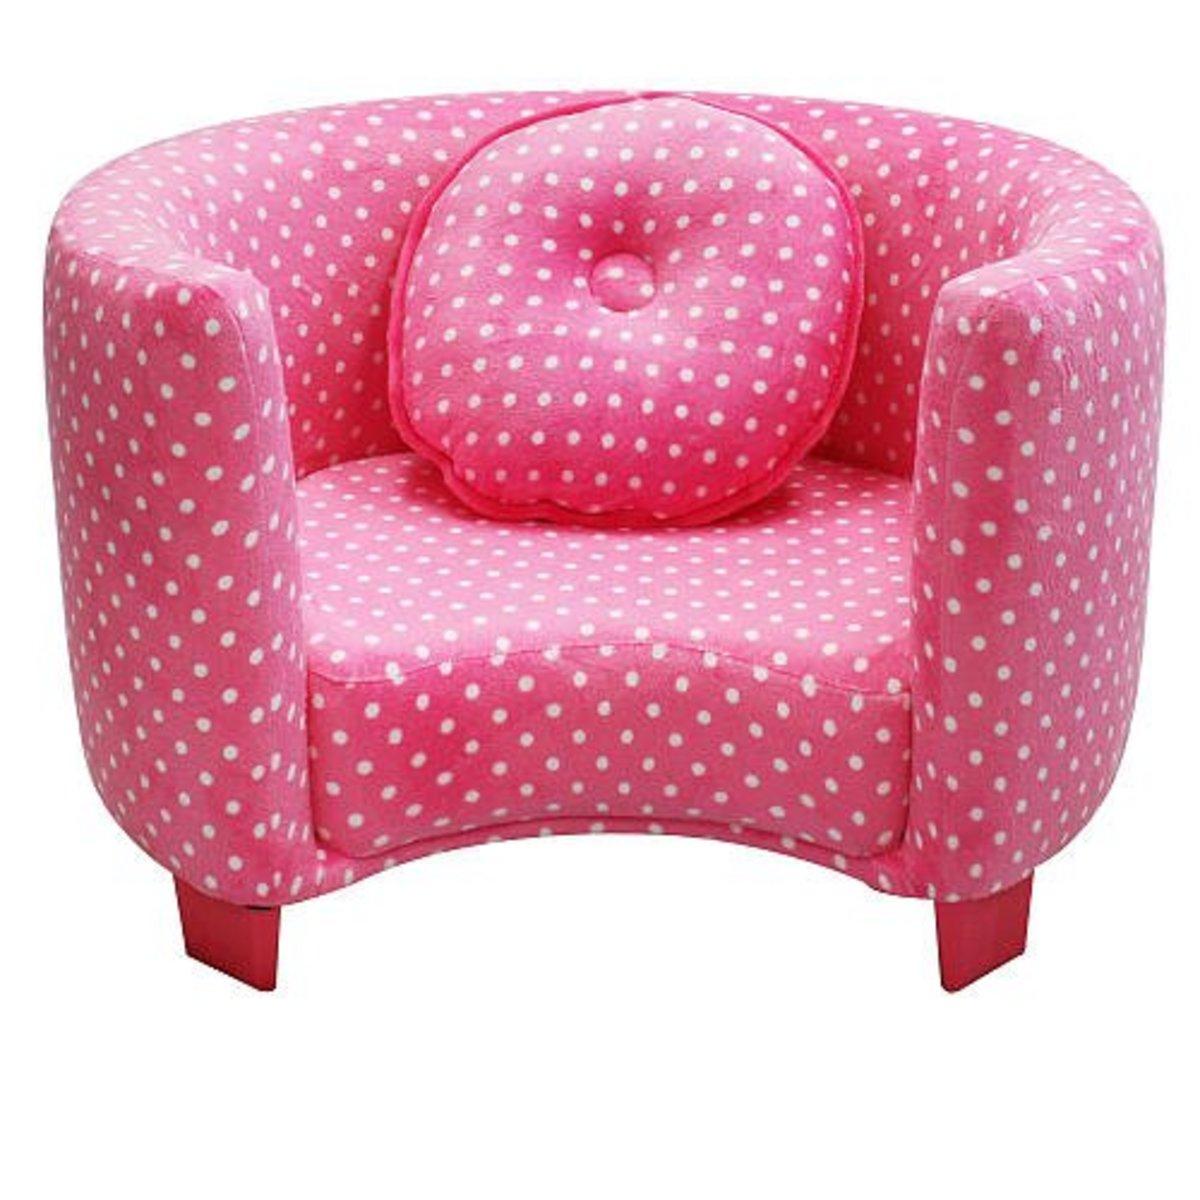 Kids' Round Upholstered Pink Polka Dot Chair for Little Girls